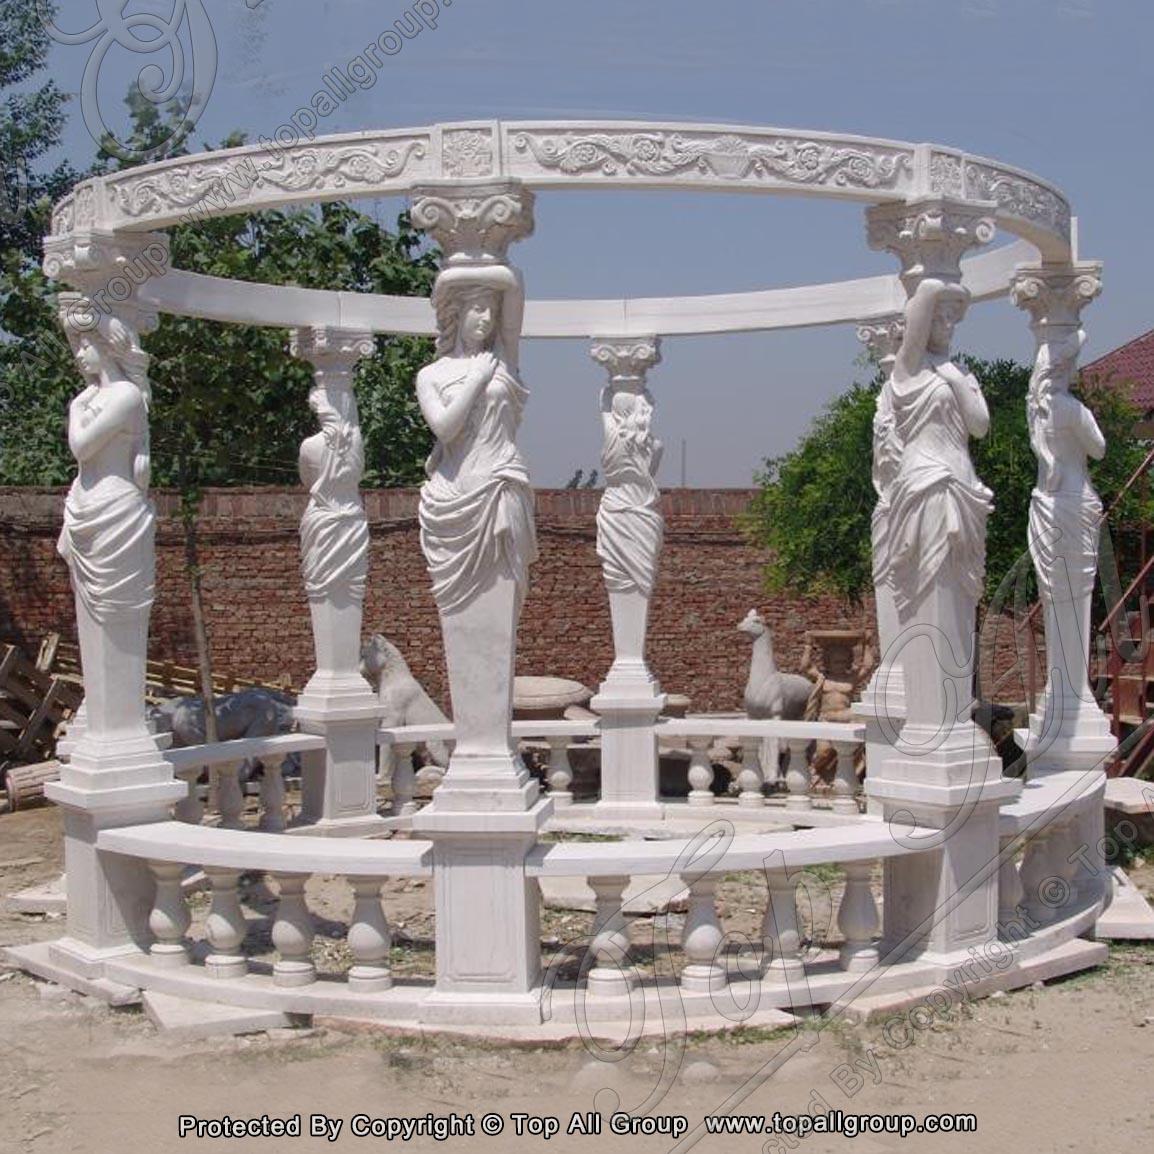 Garden gazebo with marble sculpture